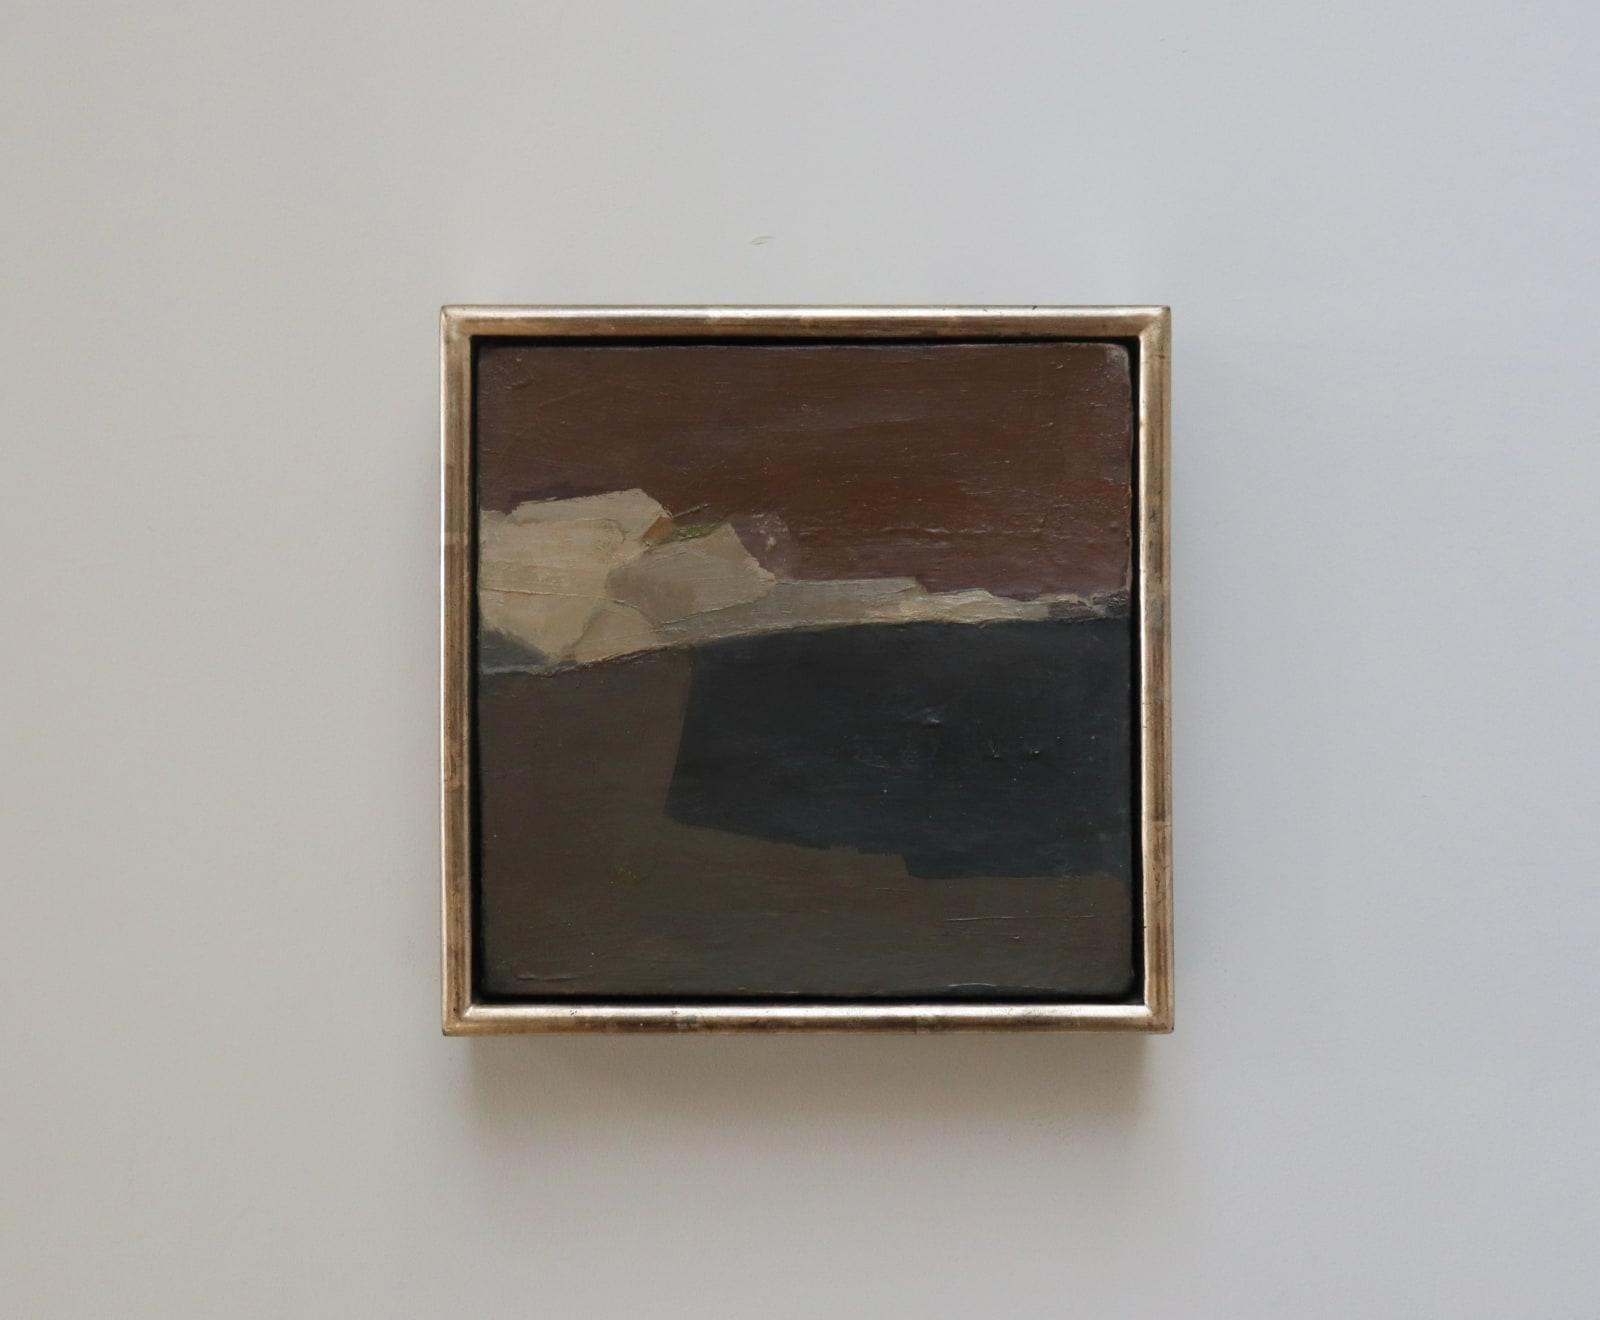 Deborah Tarr, Black Rocks